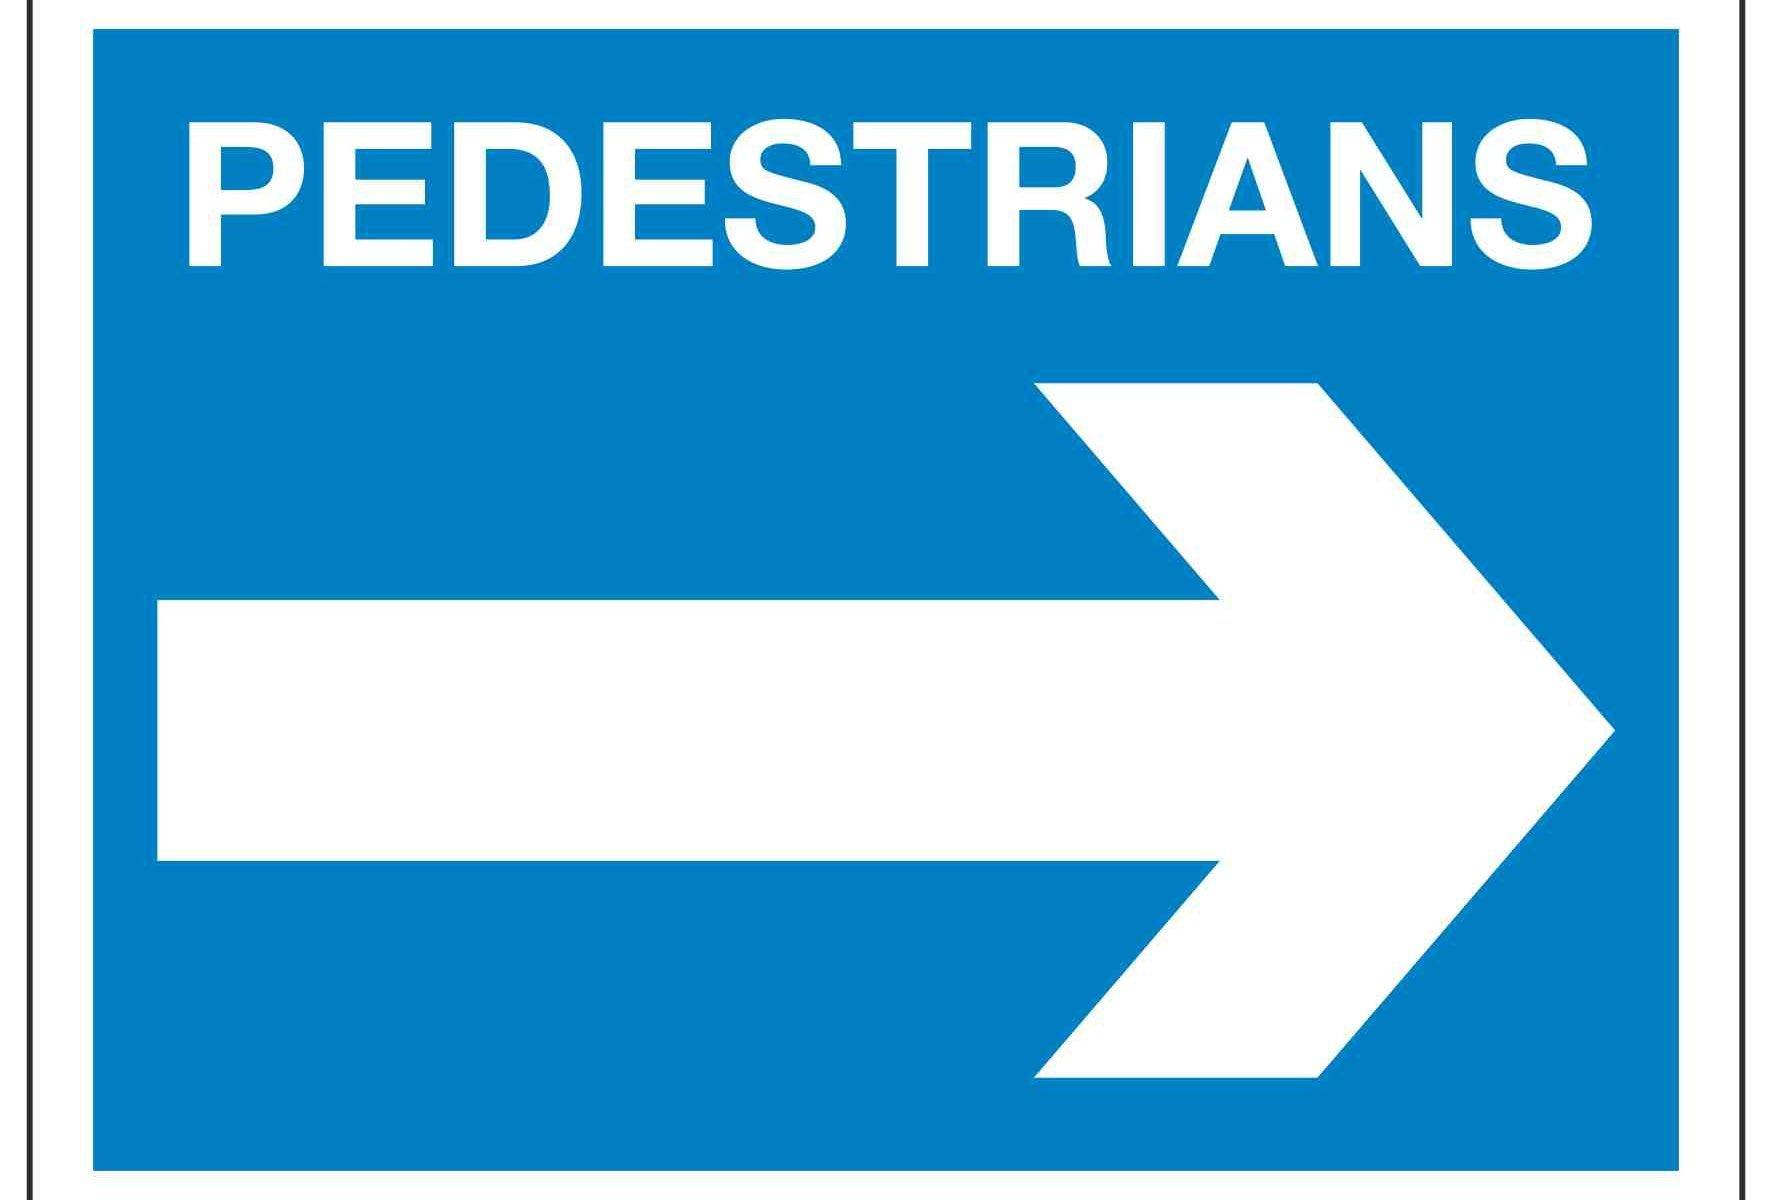 PEDESTRIANS (Right arrow)